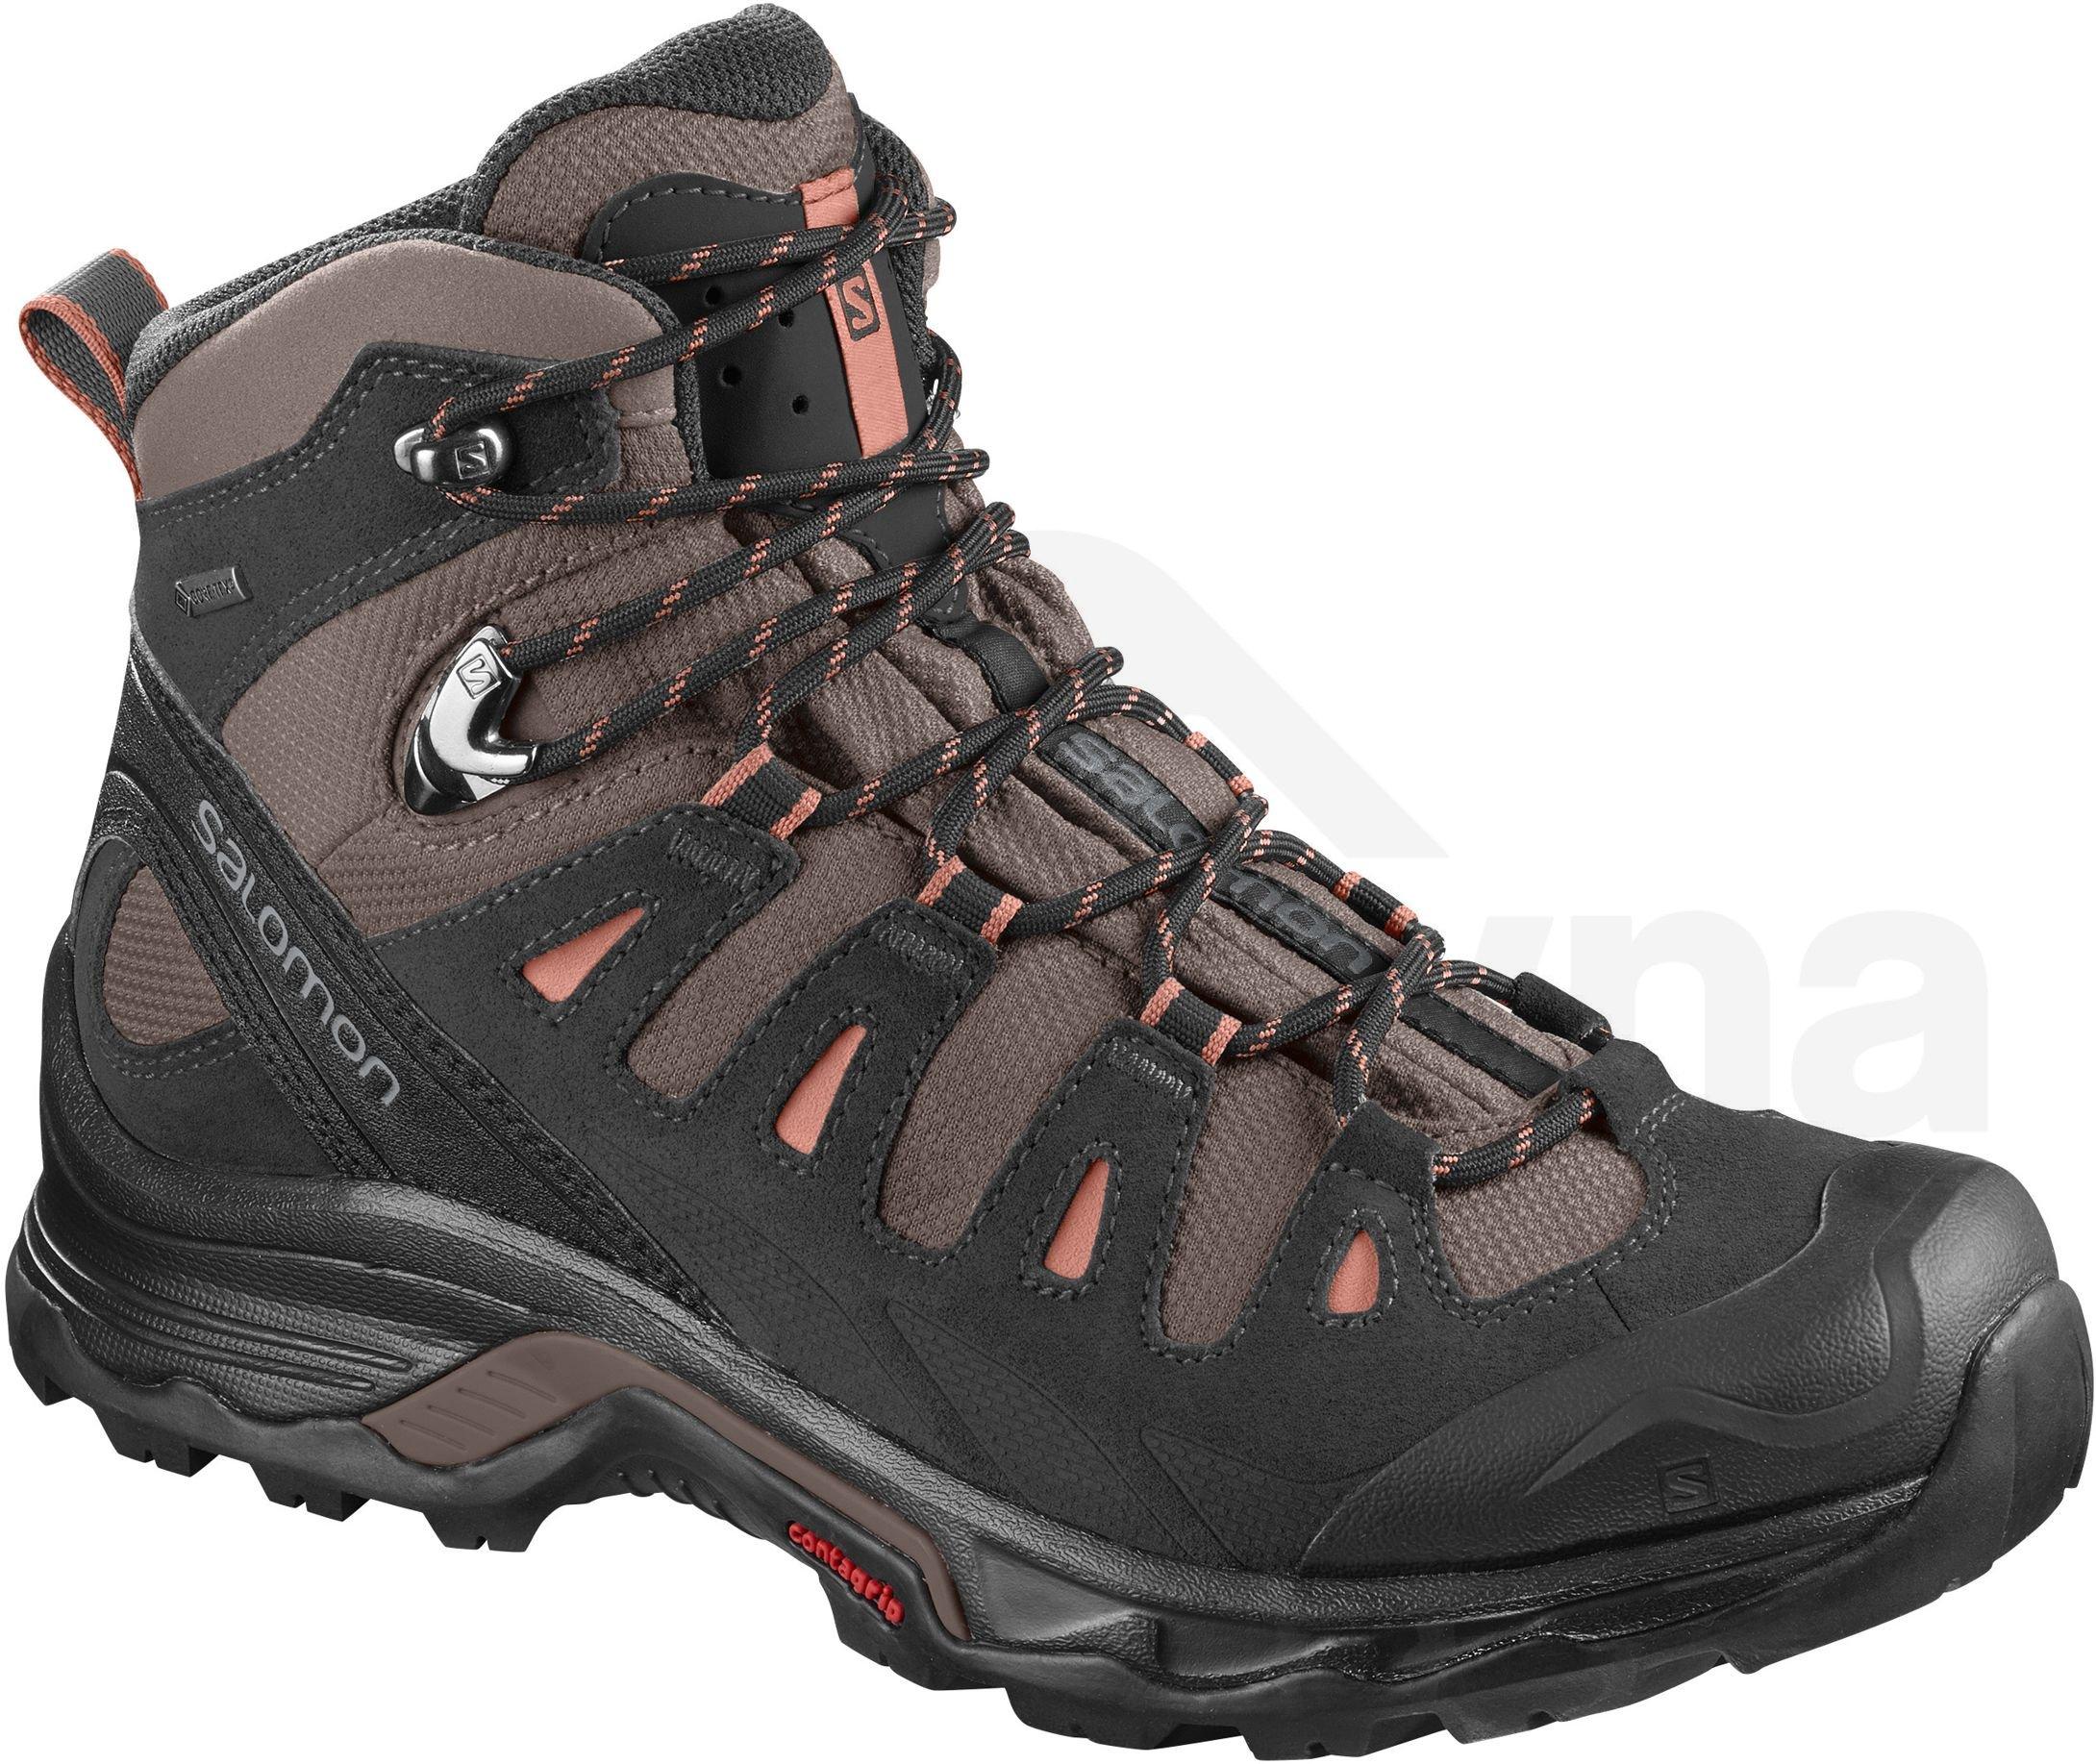 Dámská turistická obuv Salomon QUEST 4D 3 GTX W Teak - L40245800 ... be02cfaab46